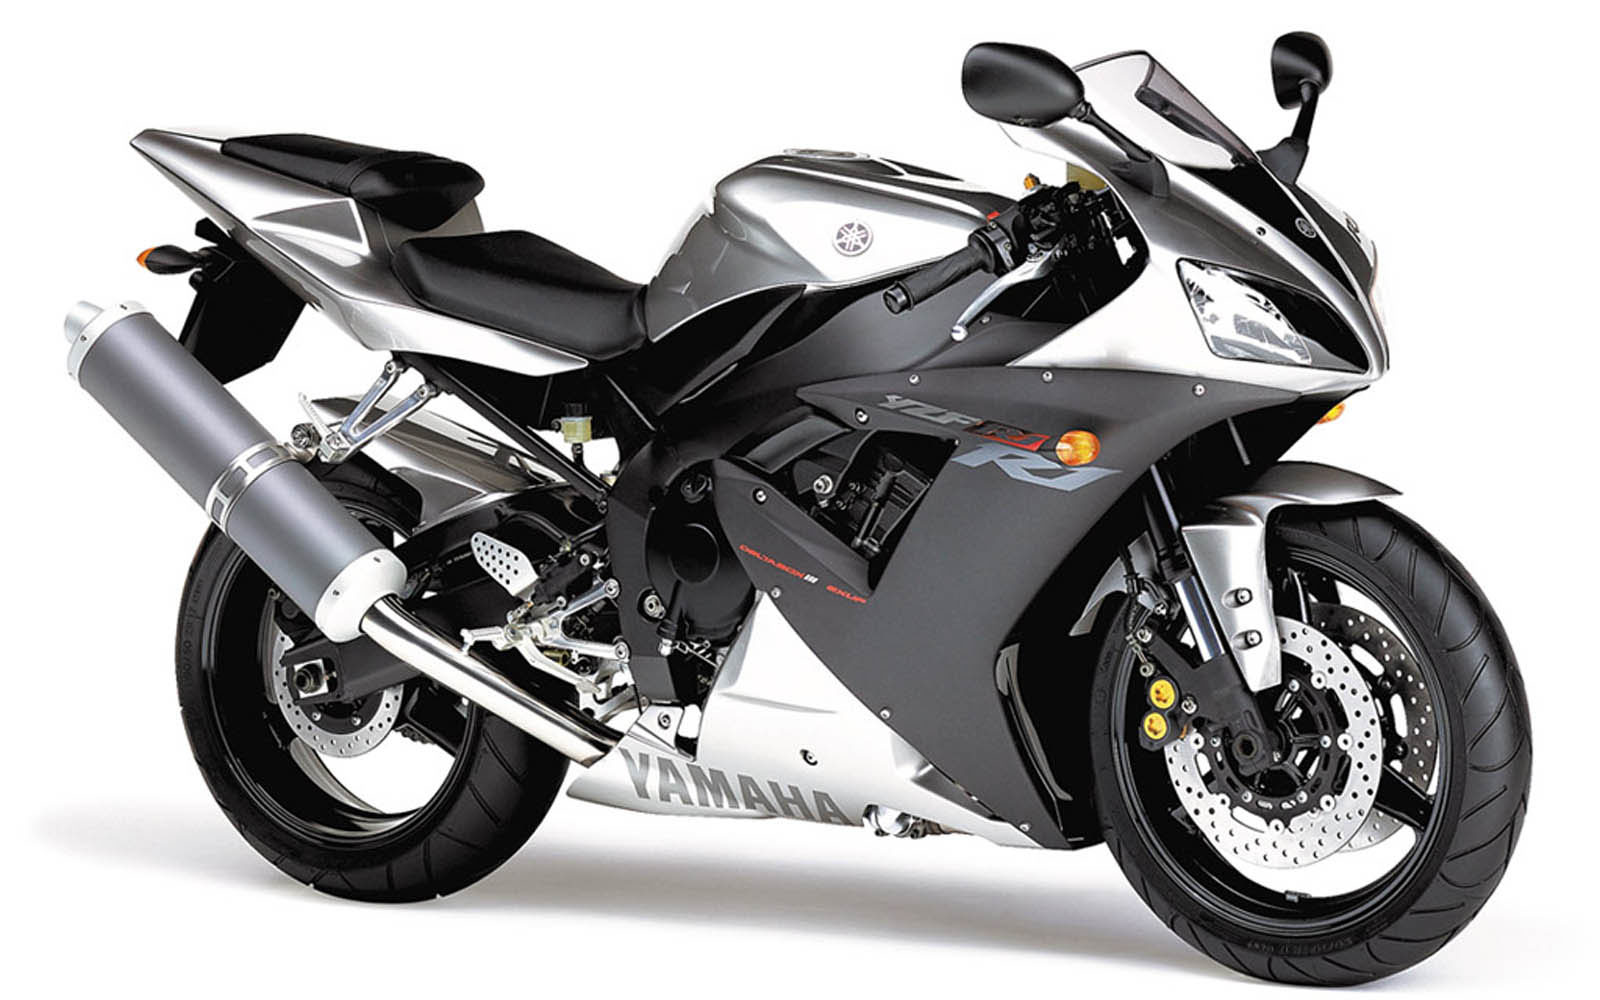 Desktop wallpapers yamaha r1 motorcycle desktop wallpapers for Motor sport yamaha